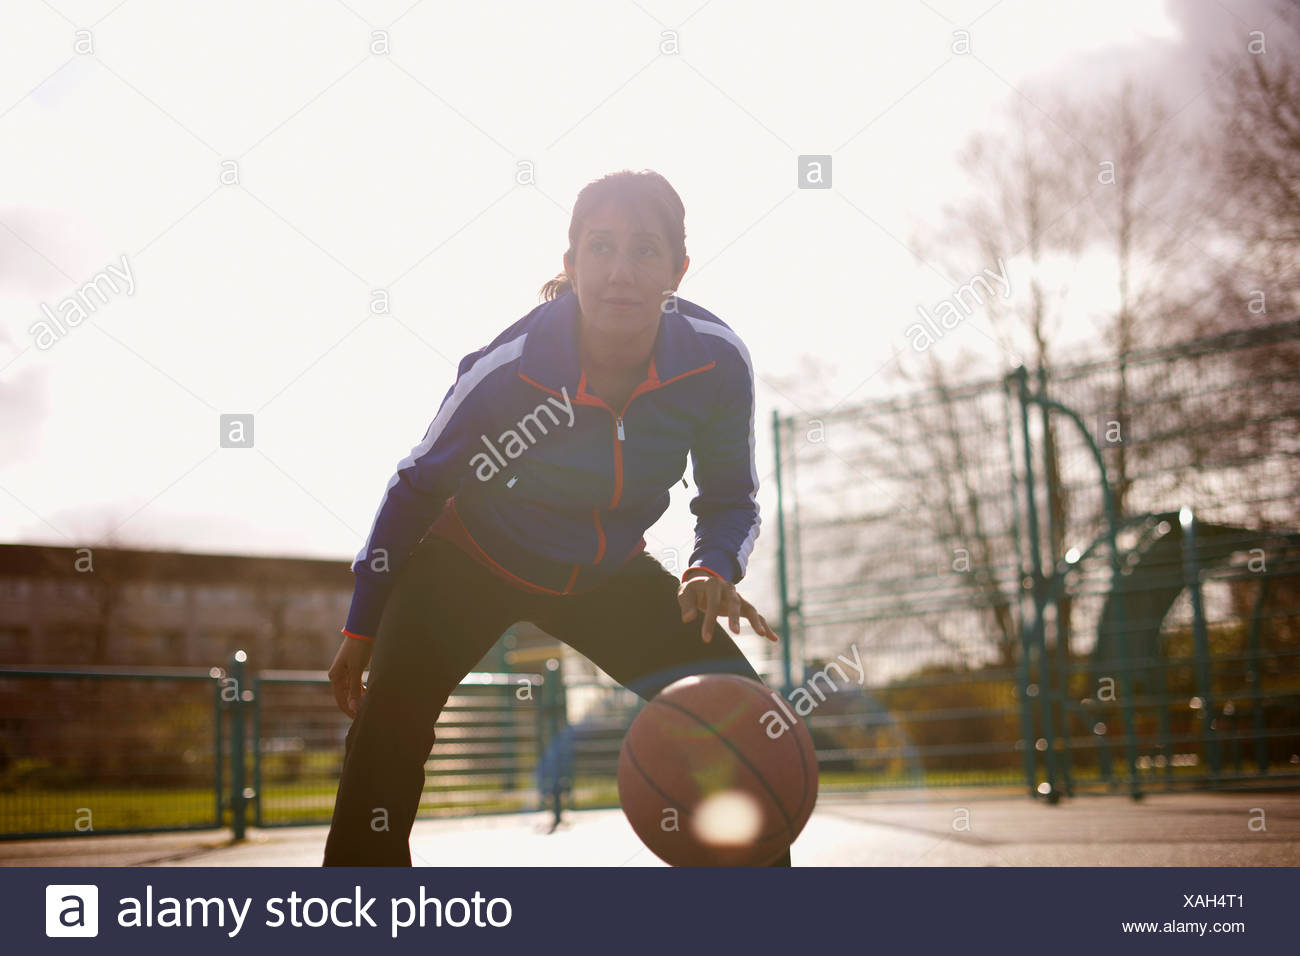 A Woman Playing Basketball Imágenes De Stock A Woman: Adult Female Basketball Player Asian Stock Photos & Adult